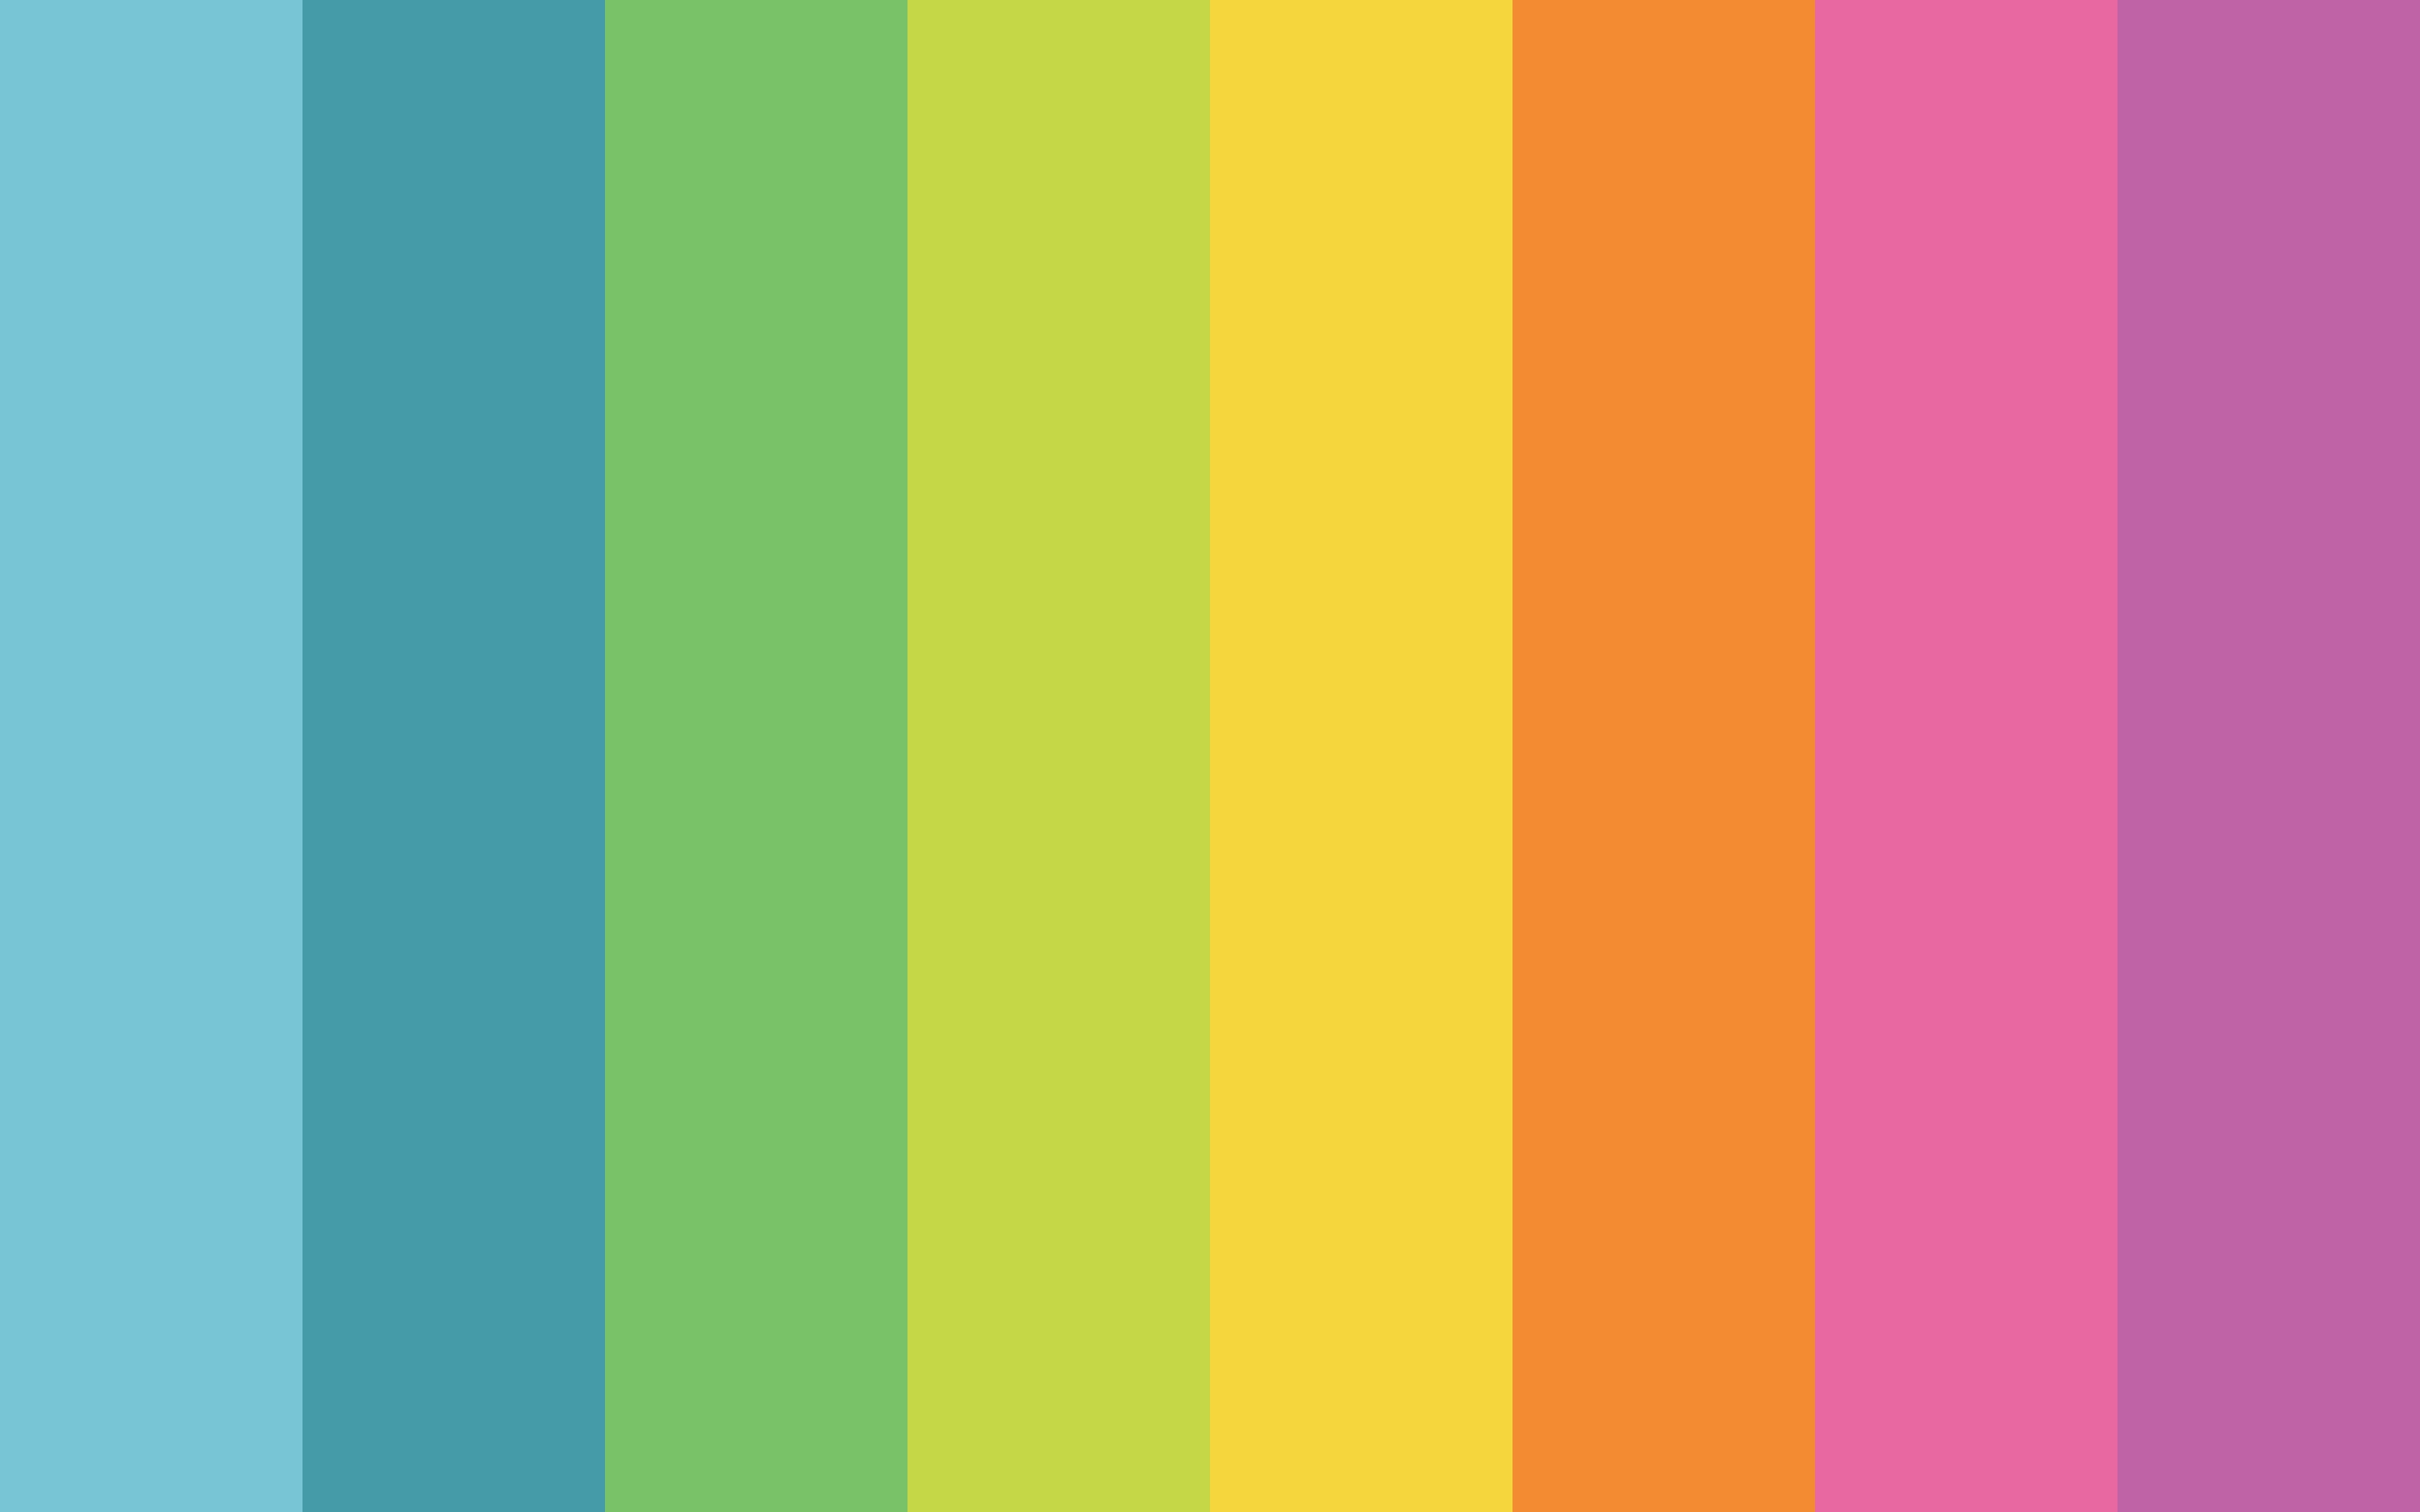 Minimal Rainbow Wallpaper 45360